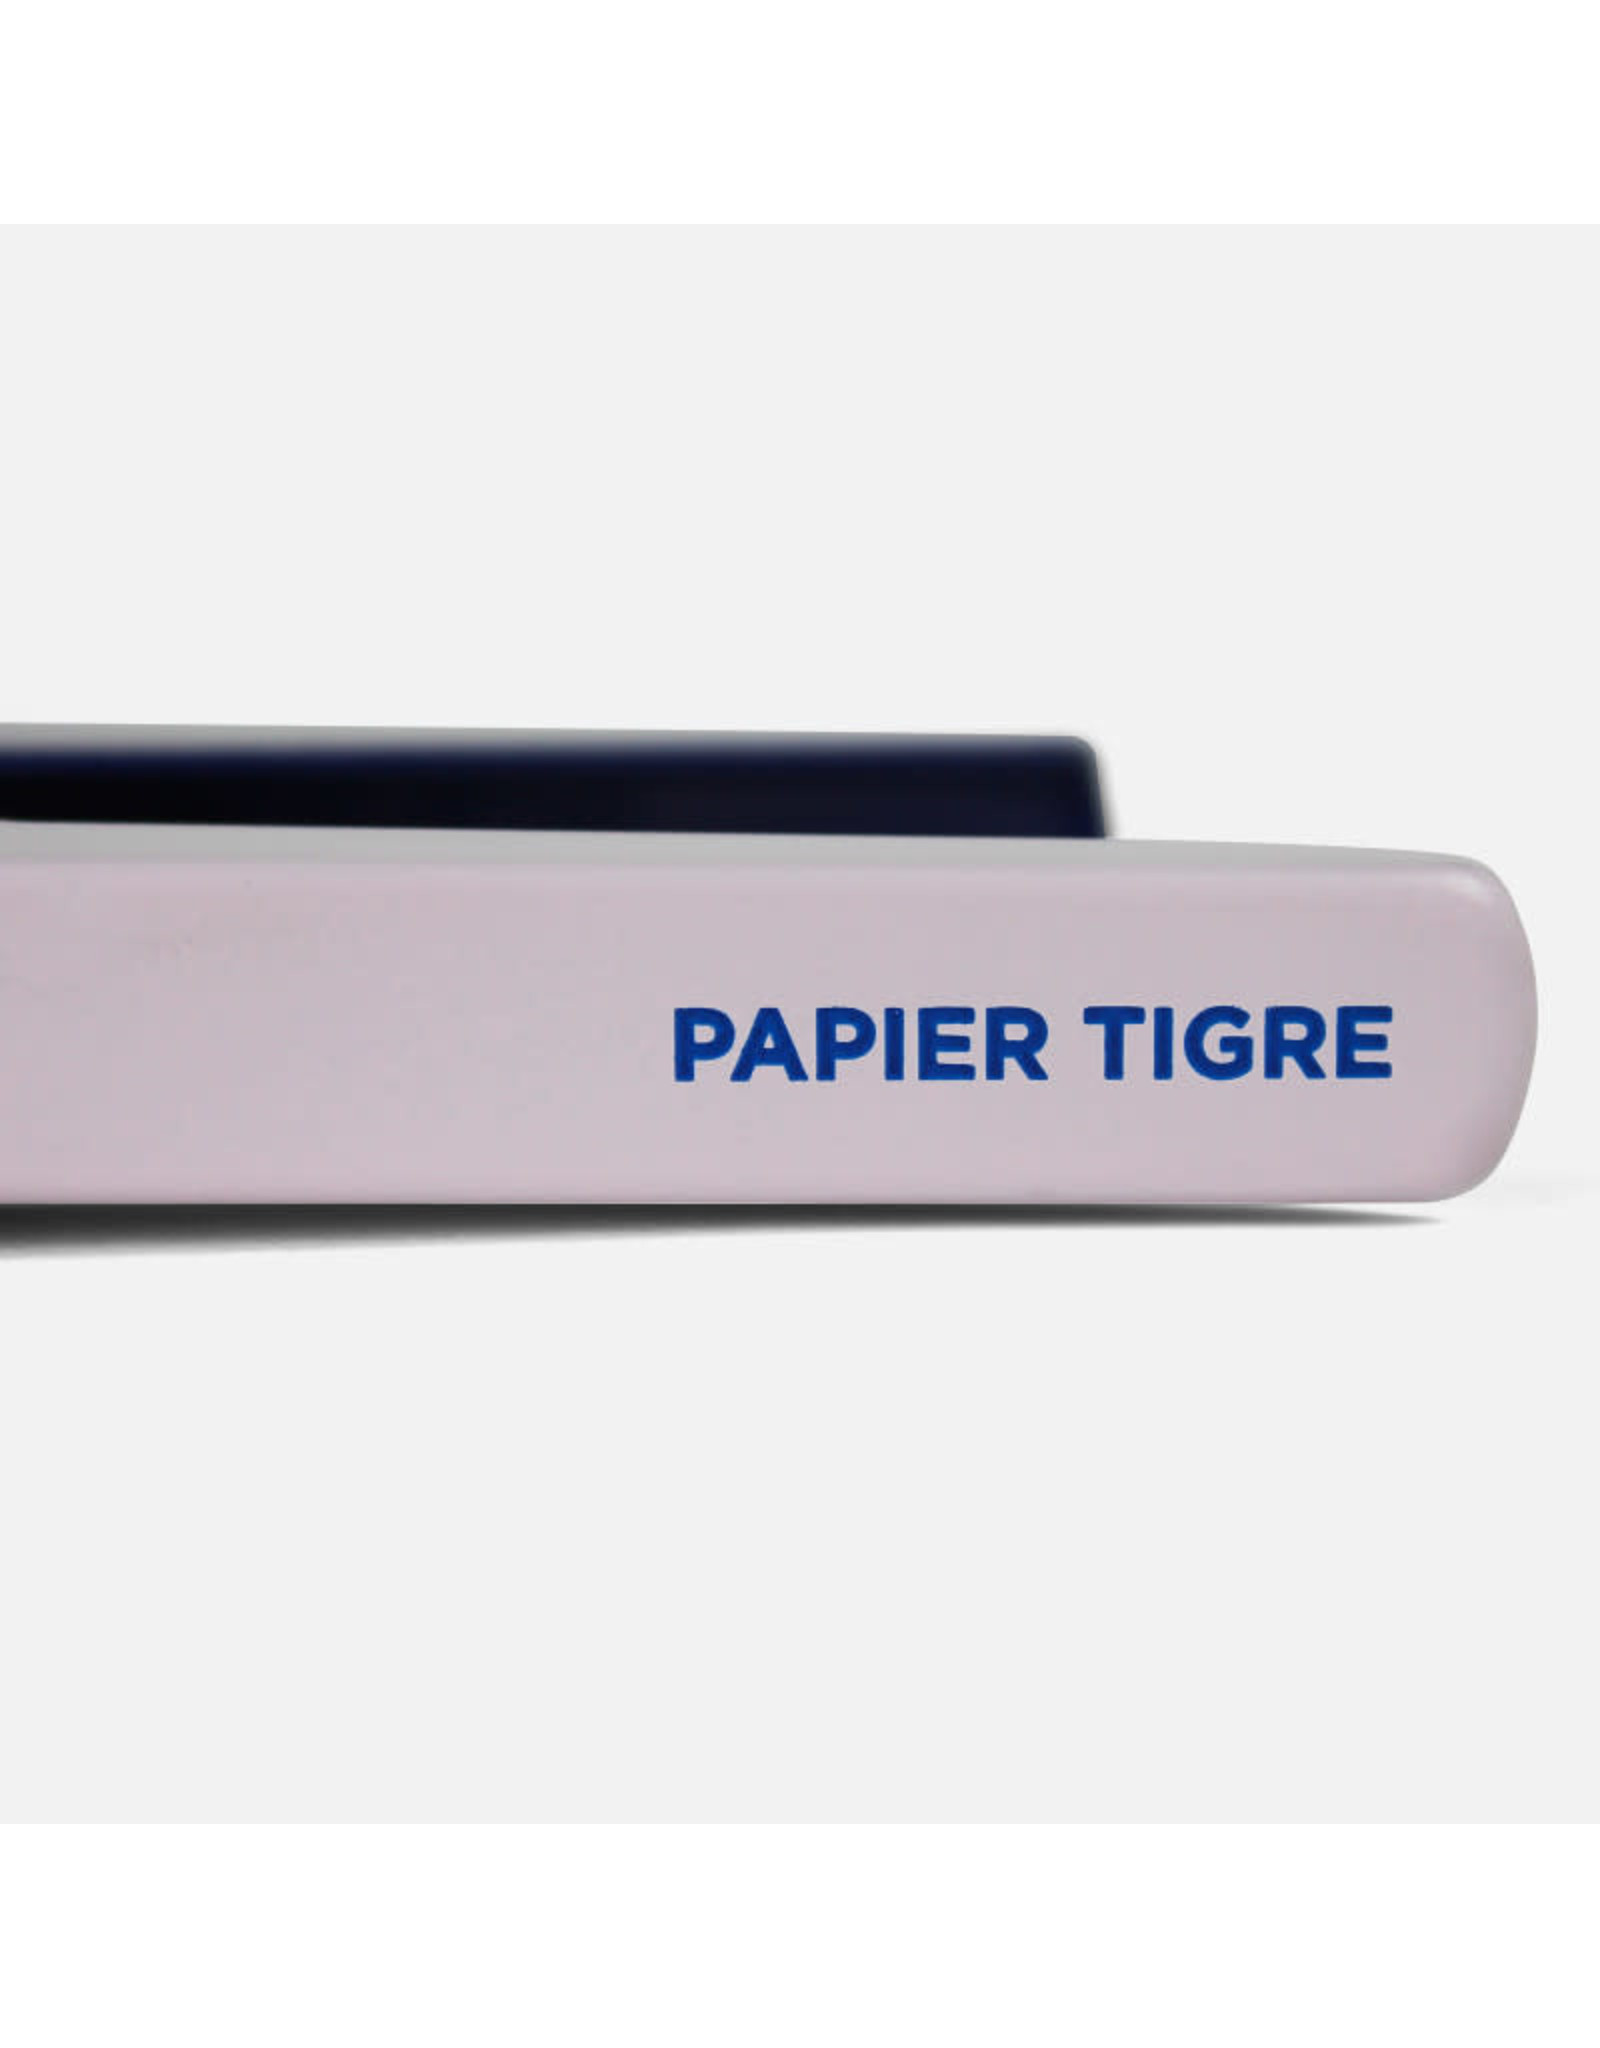 Papier Tigre Cobalt & Pink Stapler